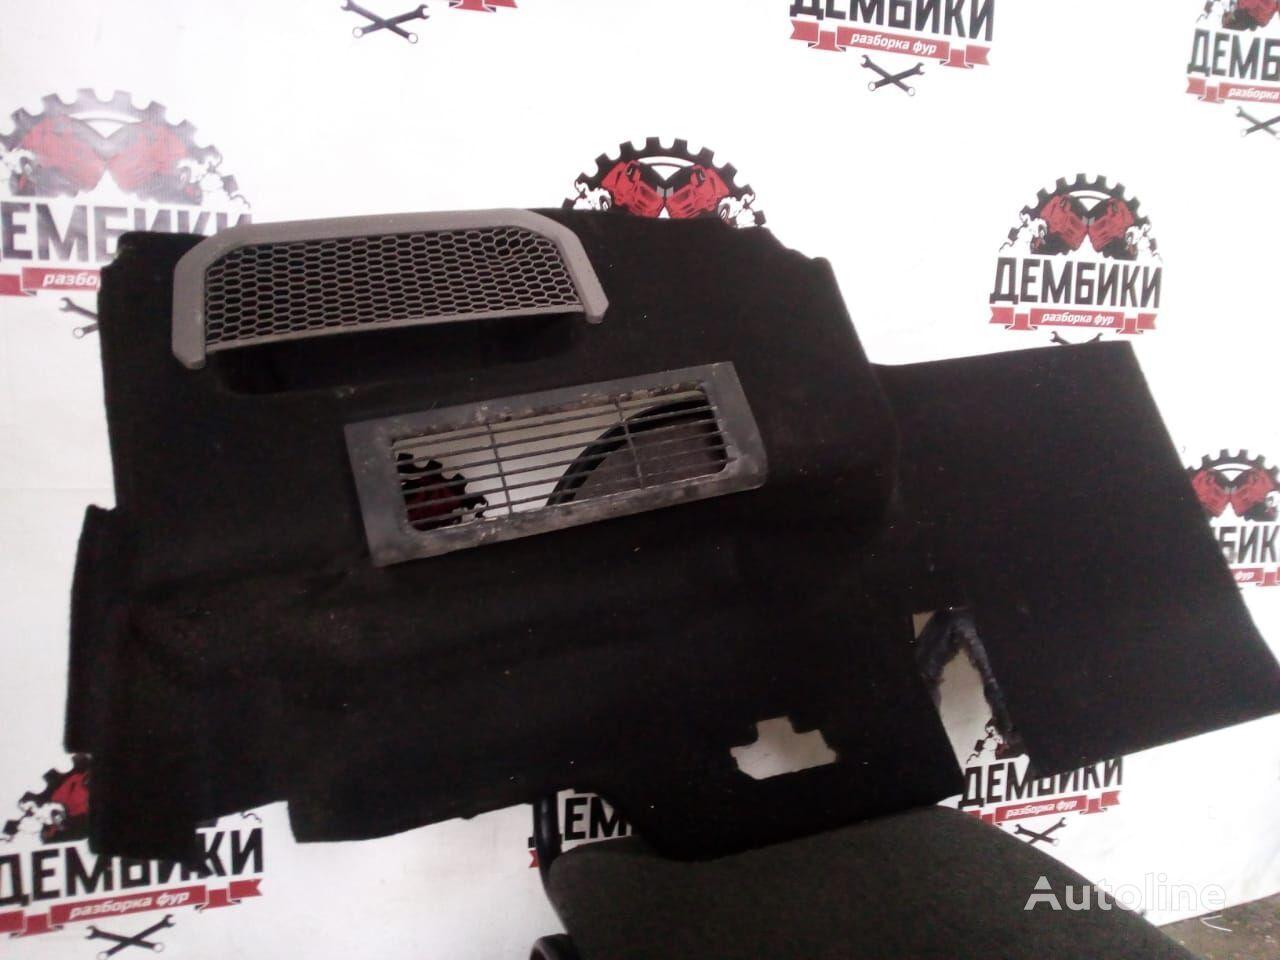 Obshivka zadney stenki kabiny front fascia for SCANIA R440 truck